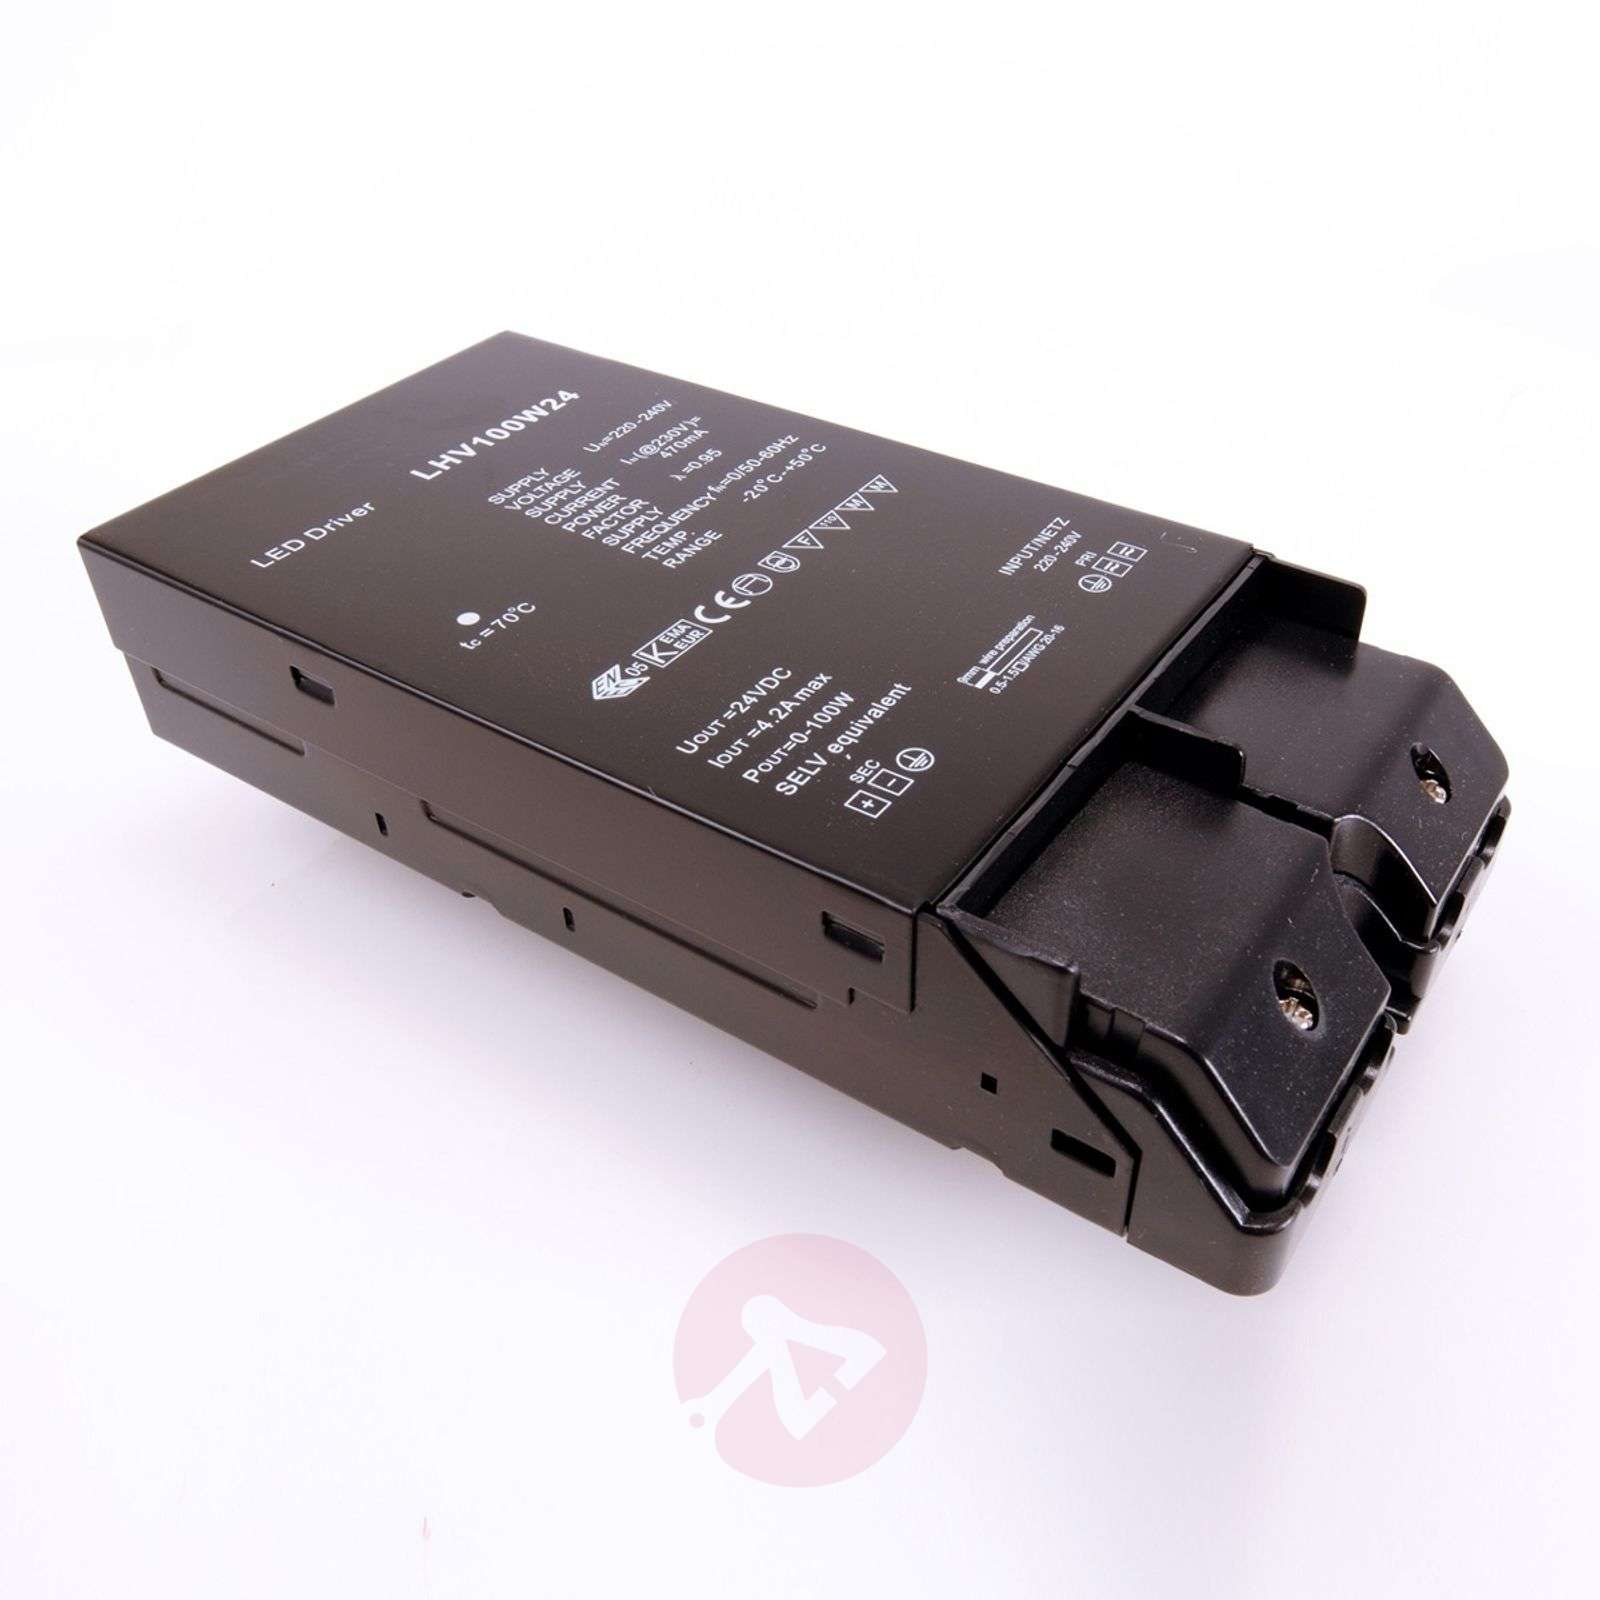 24V-kytkentävirtalähde 100W ledille-2501888-01